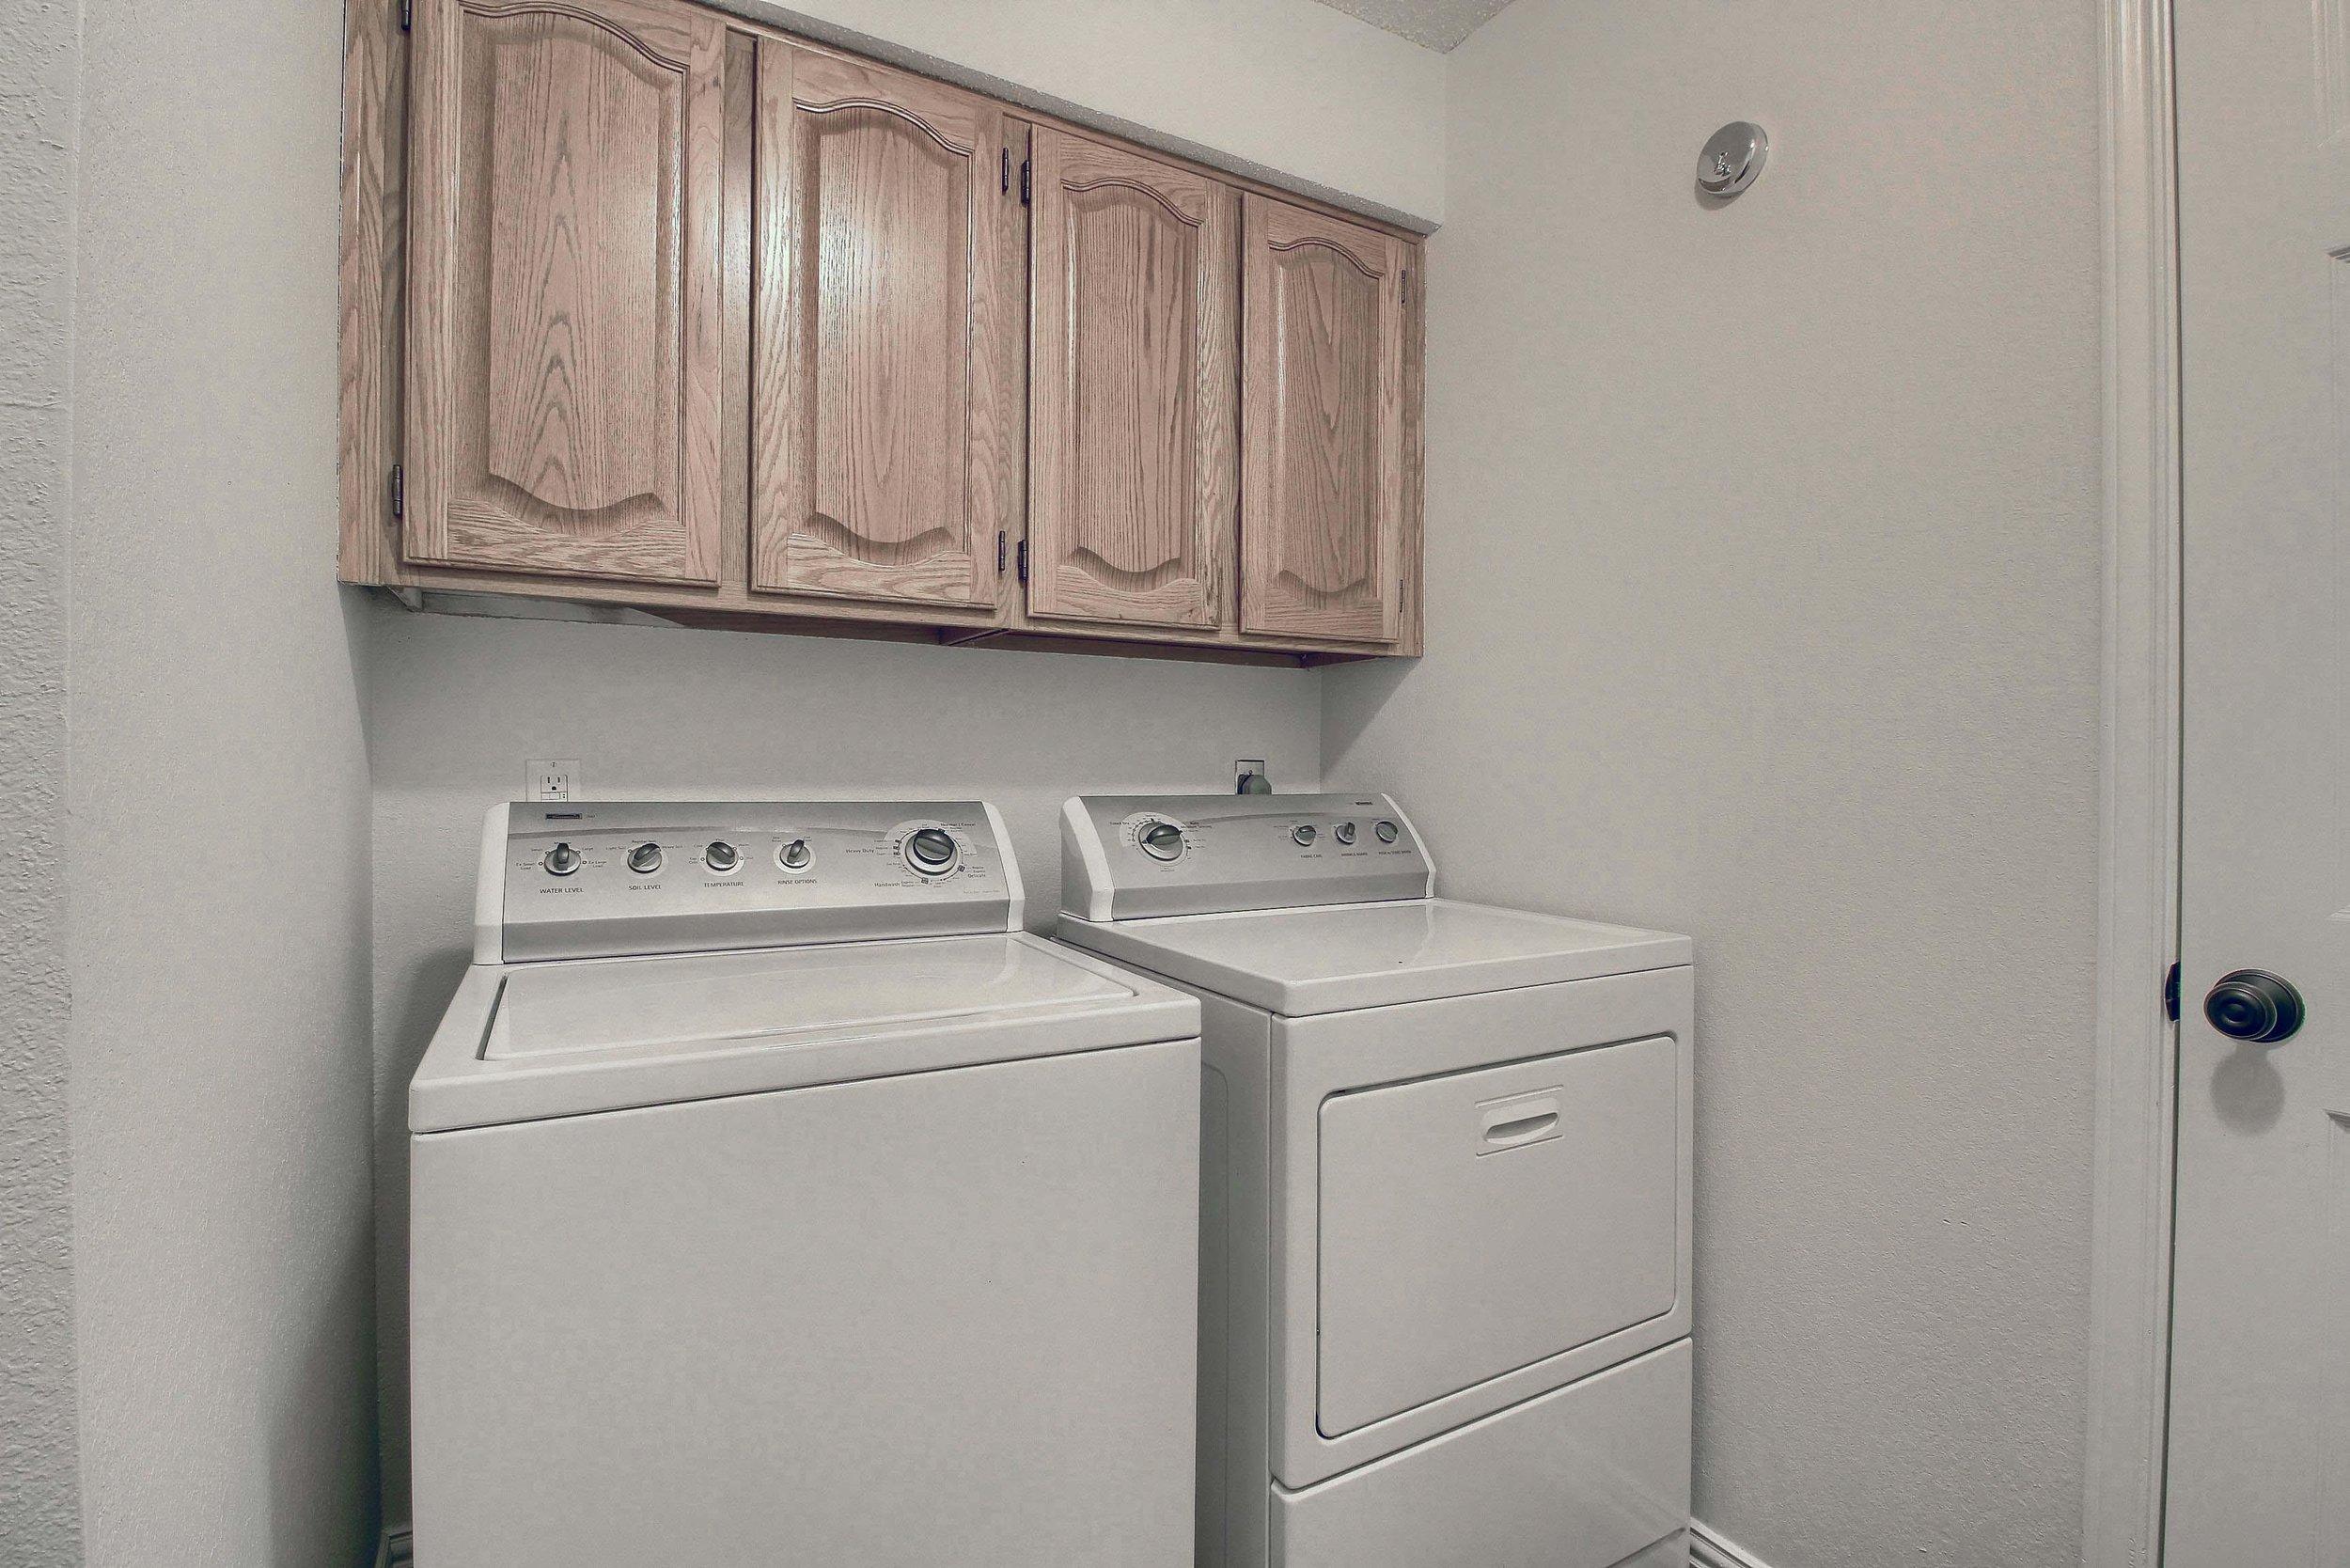 13_Laundry_Room_IMG_8566.JPG